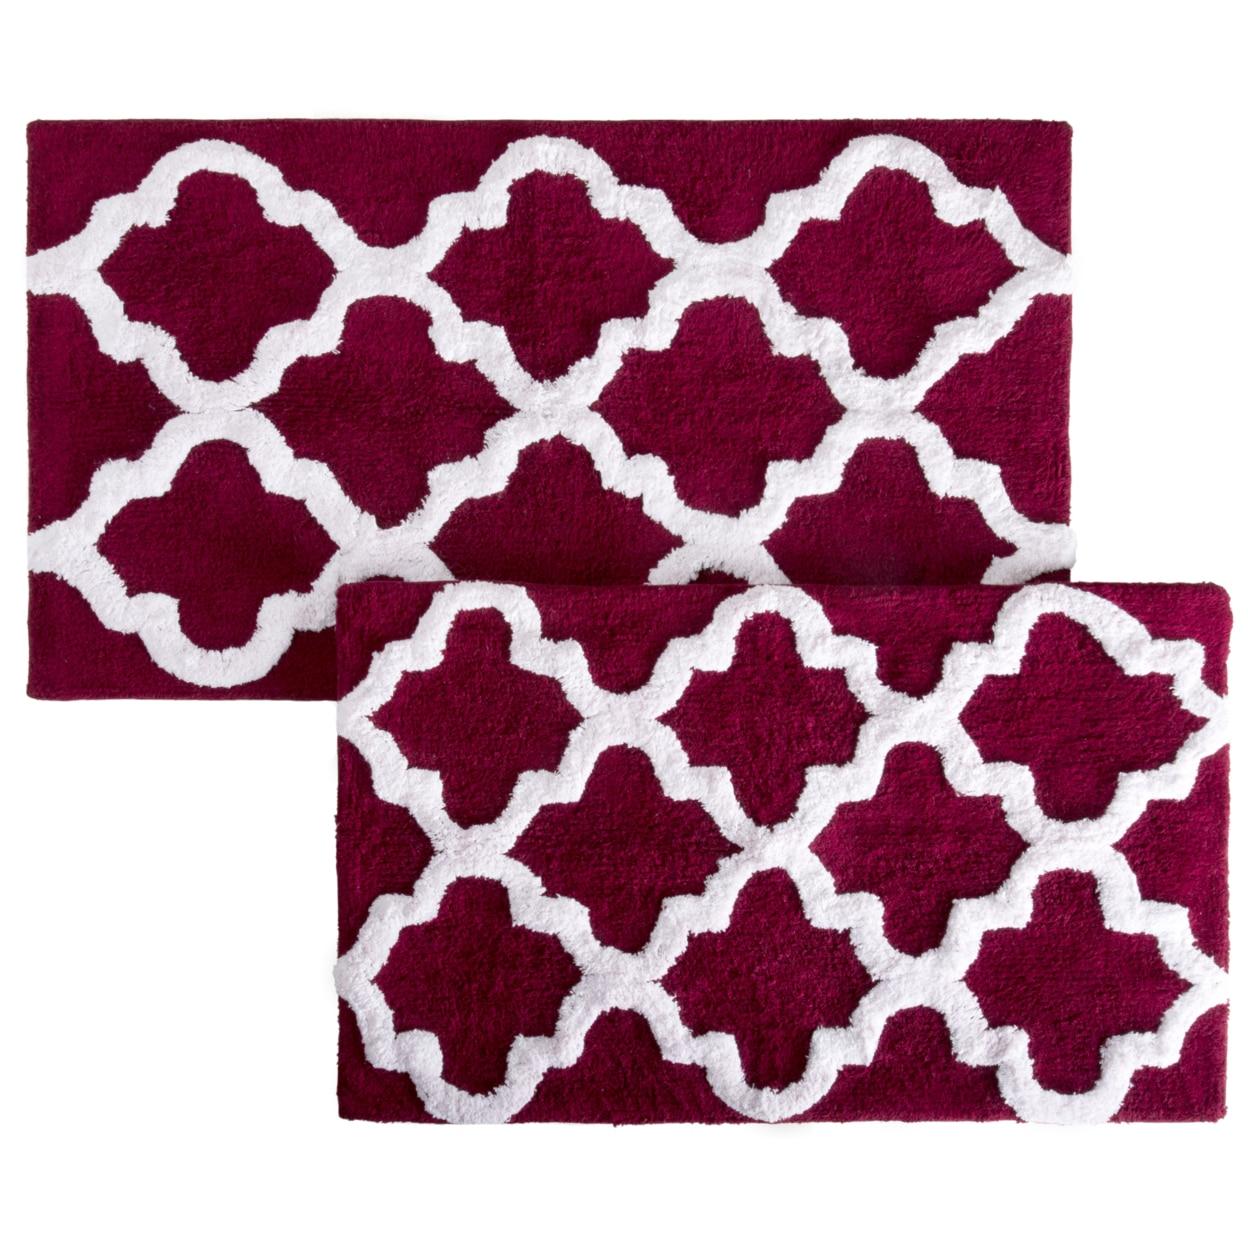 Lavish Home 100% Cotton 2 Piece Trellis Bathroom Mat Set - Burgundy (3)